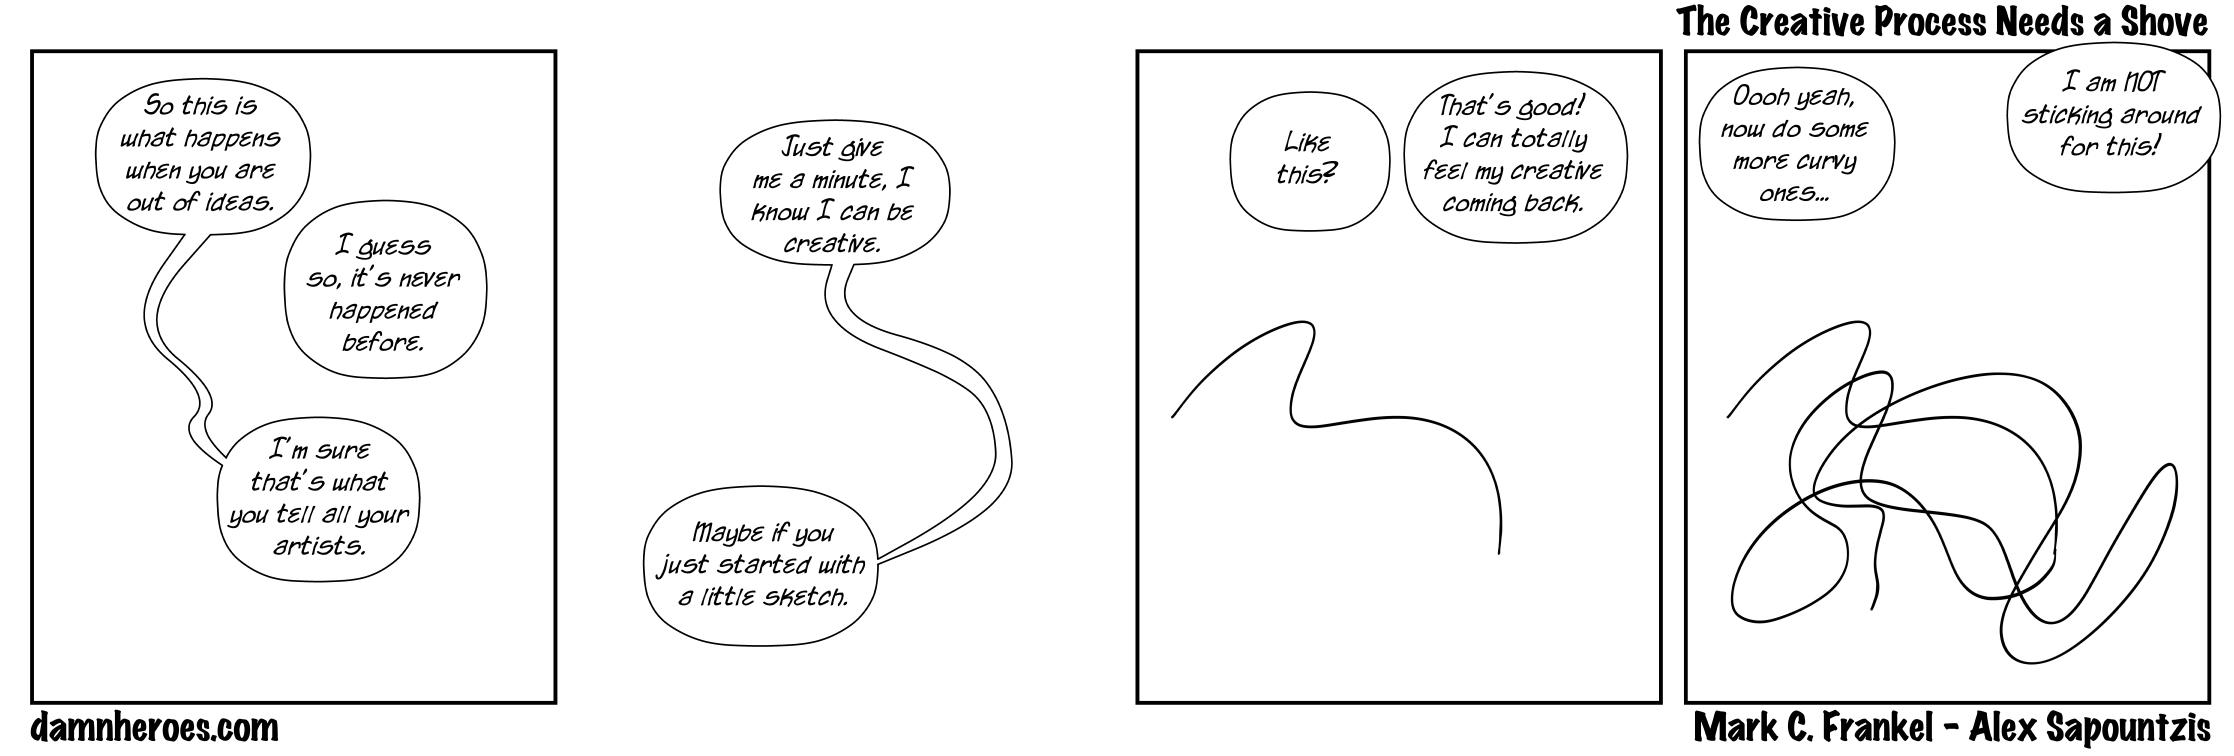 The Creative Process Needs a Shove